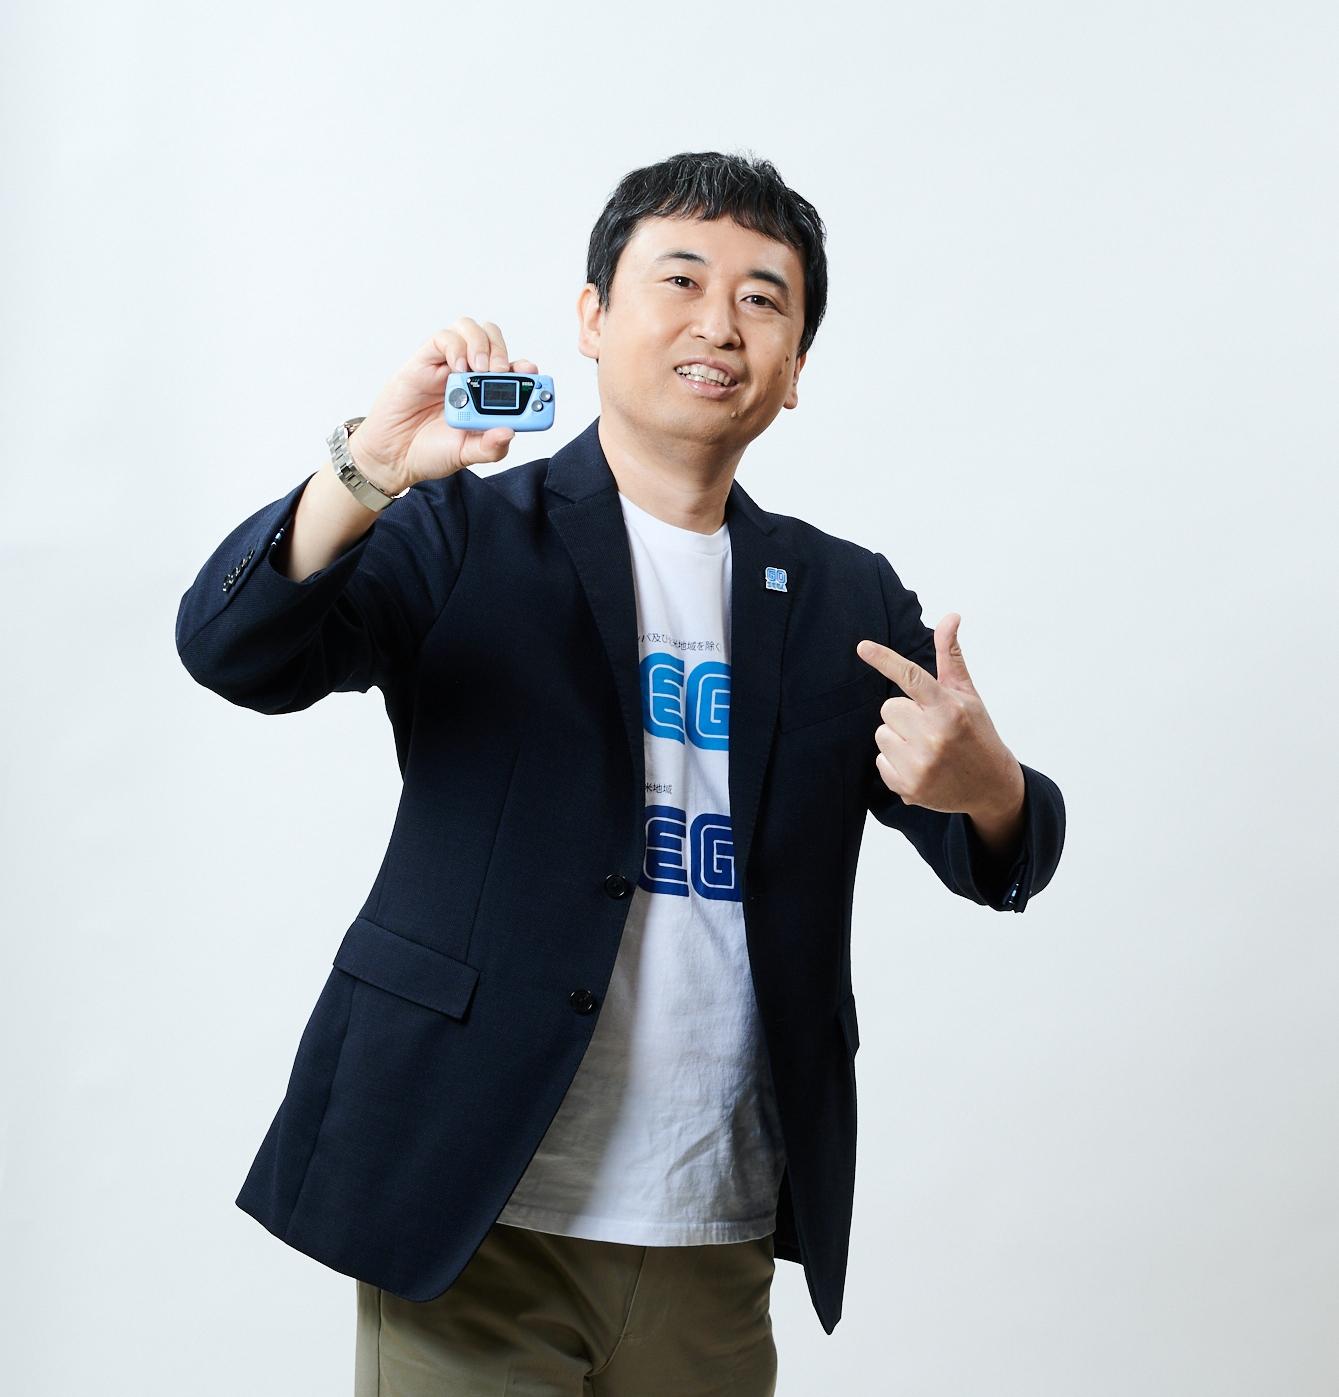 セガの奥成洋輔氏(社歴:27年)